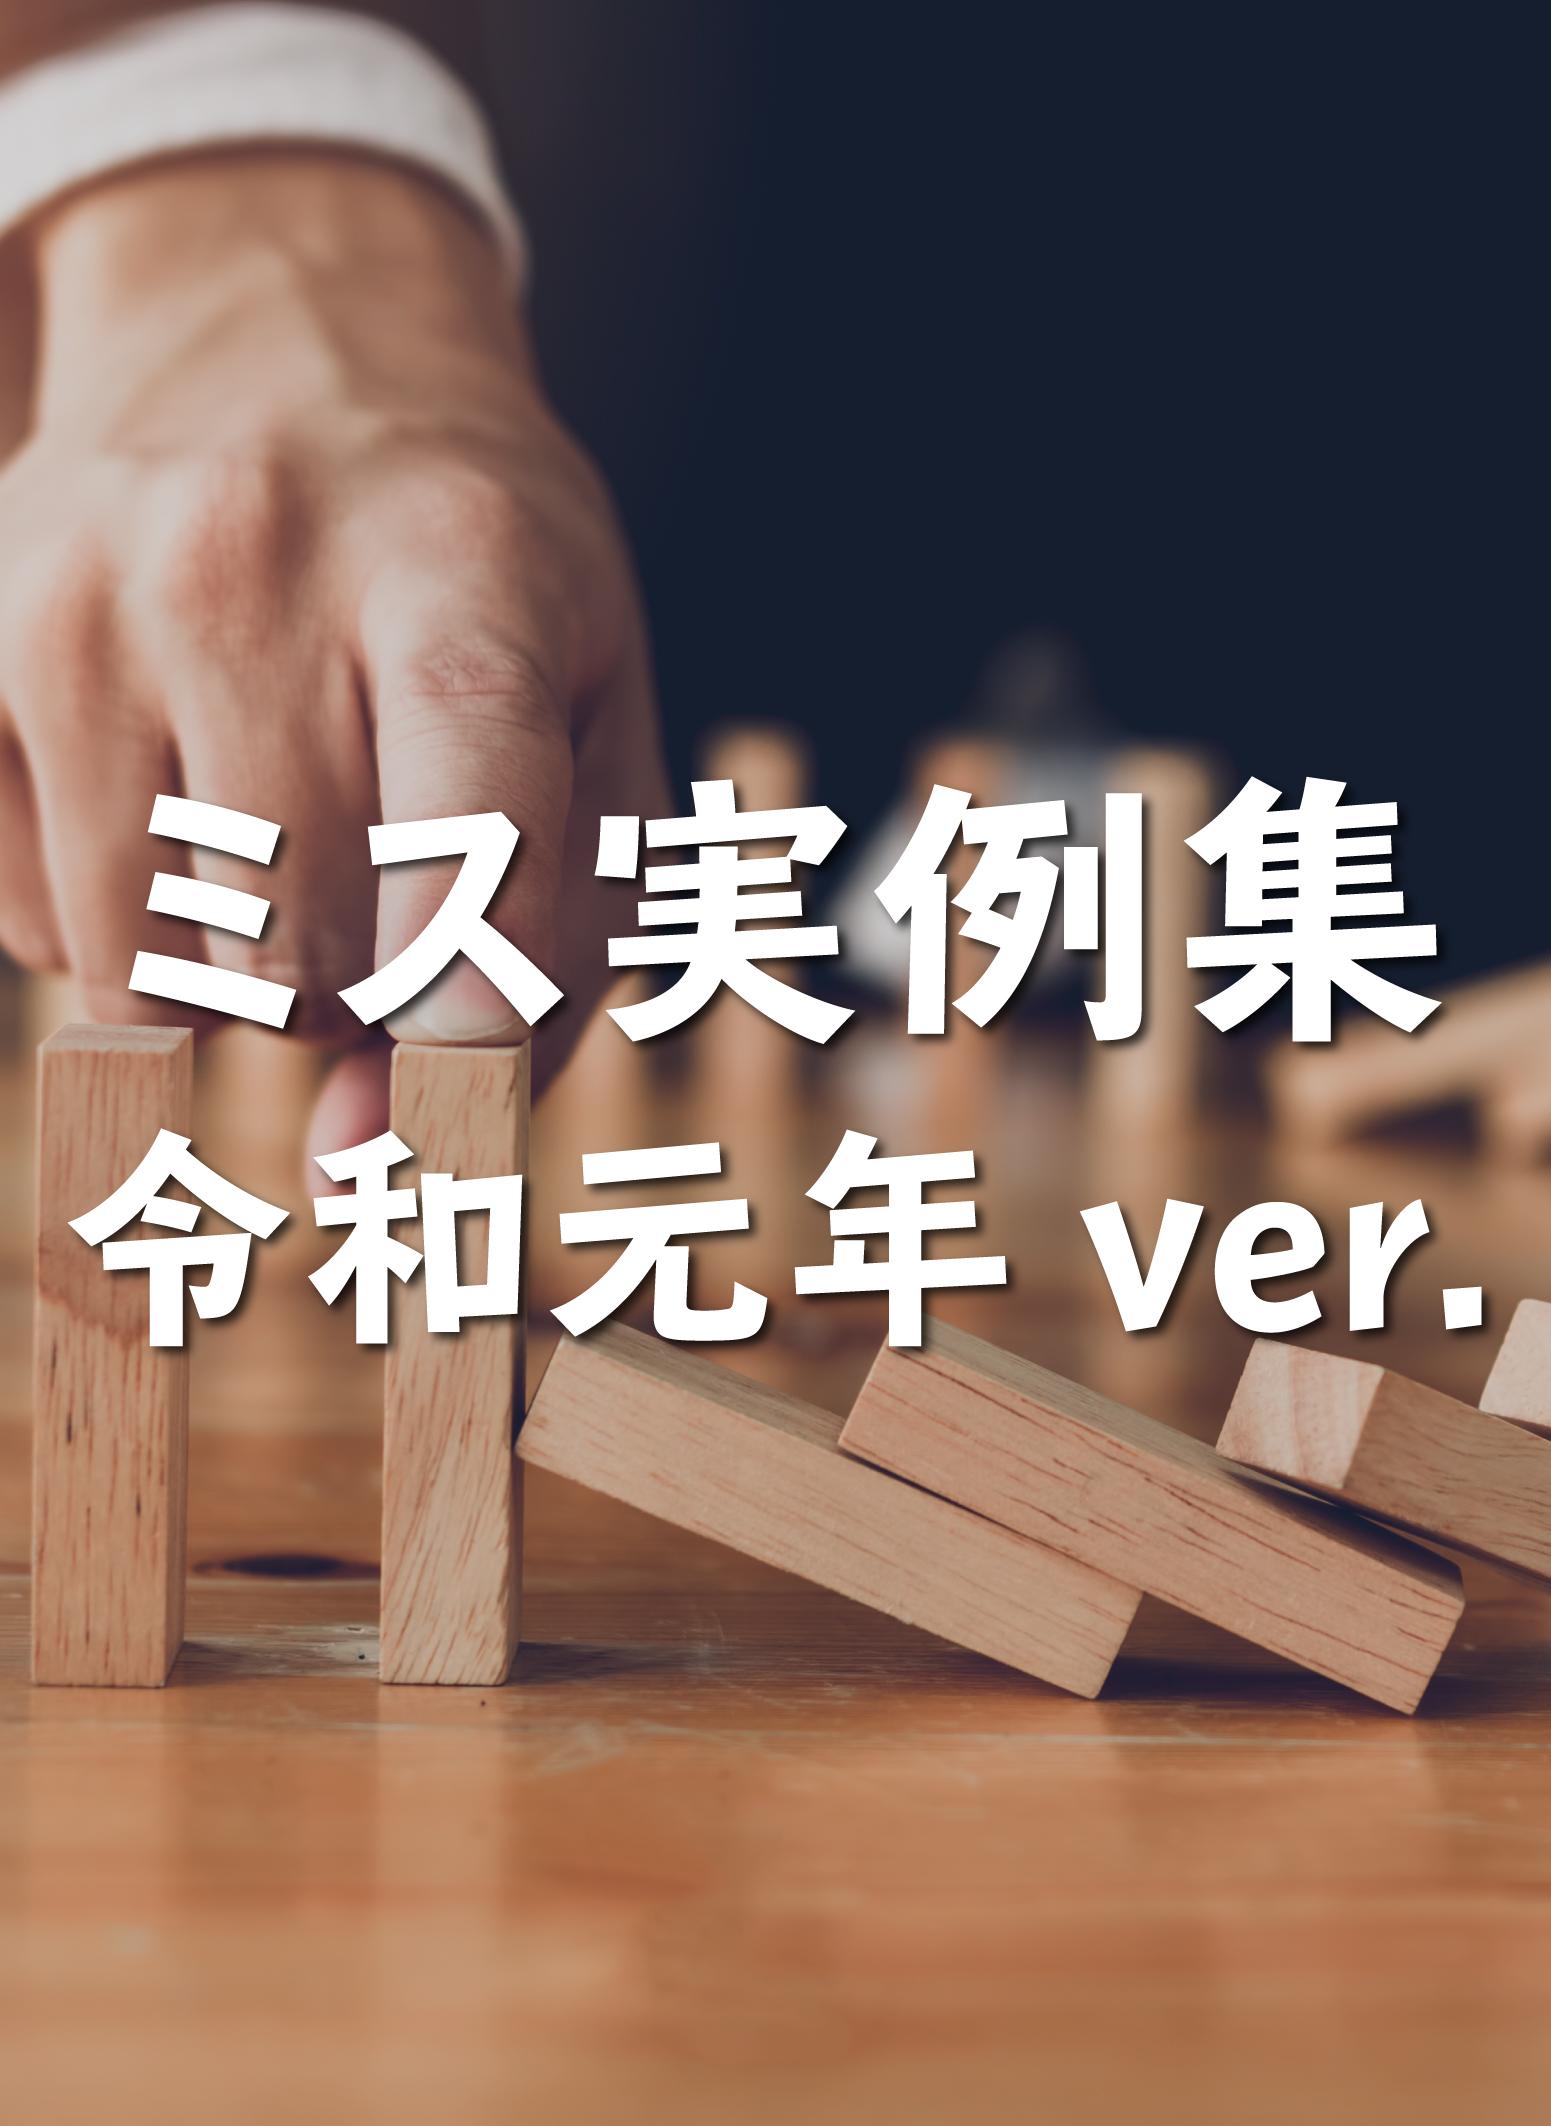 ミス実例集 令和元年 Ver.